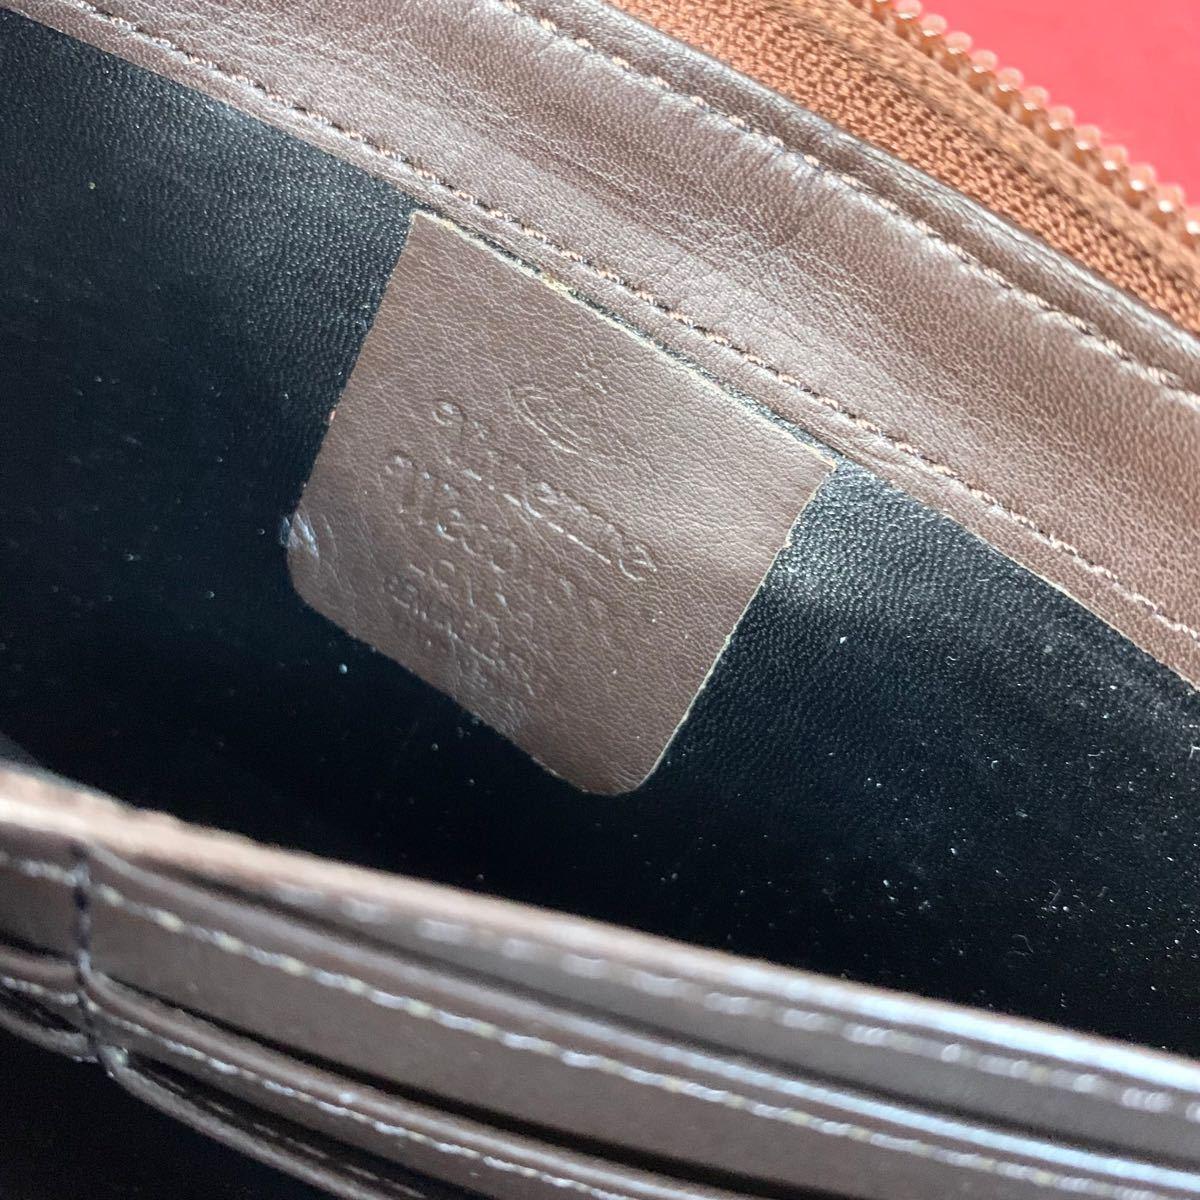 【vivienne Westwood】オーブ柄 ラウンドファスナー 長財布 箱有 男女兼用 ヴィヴィアンウエストウッド